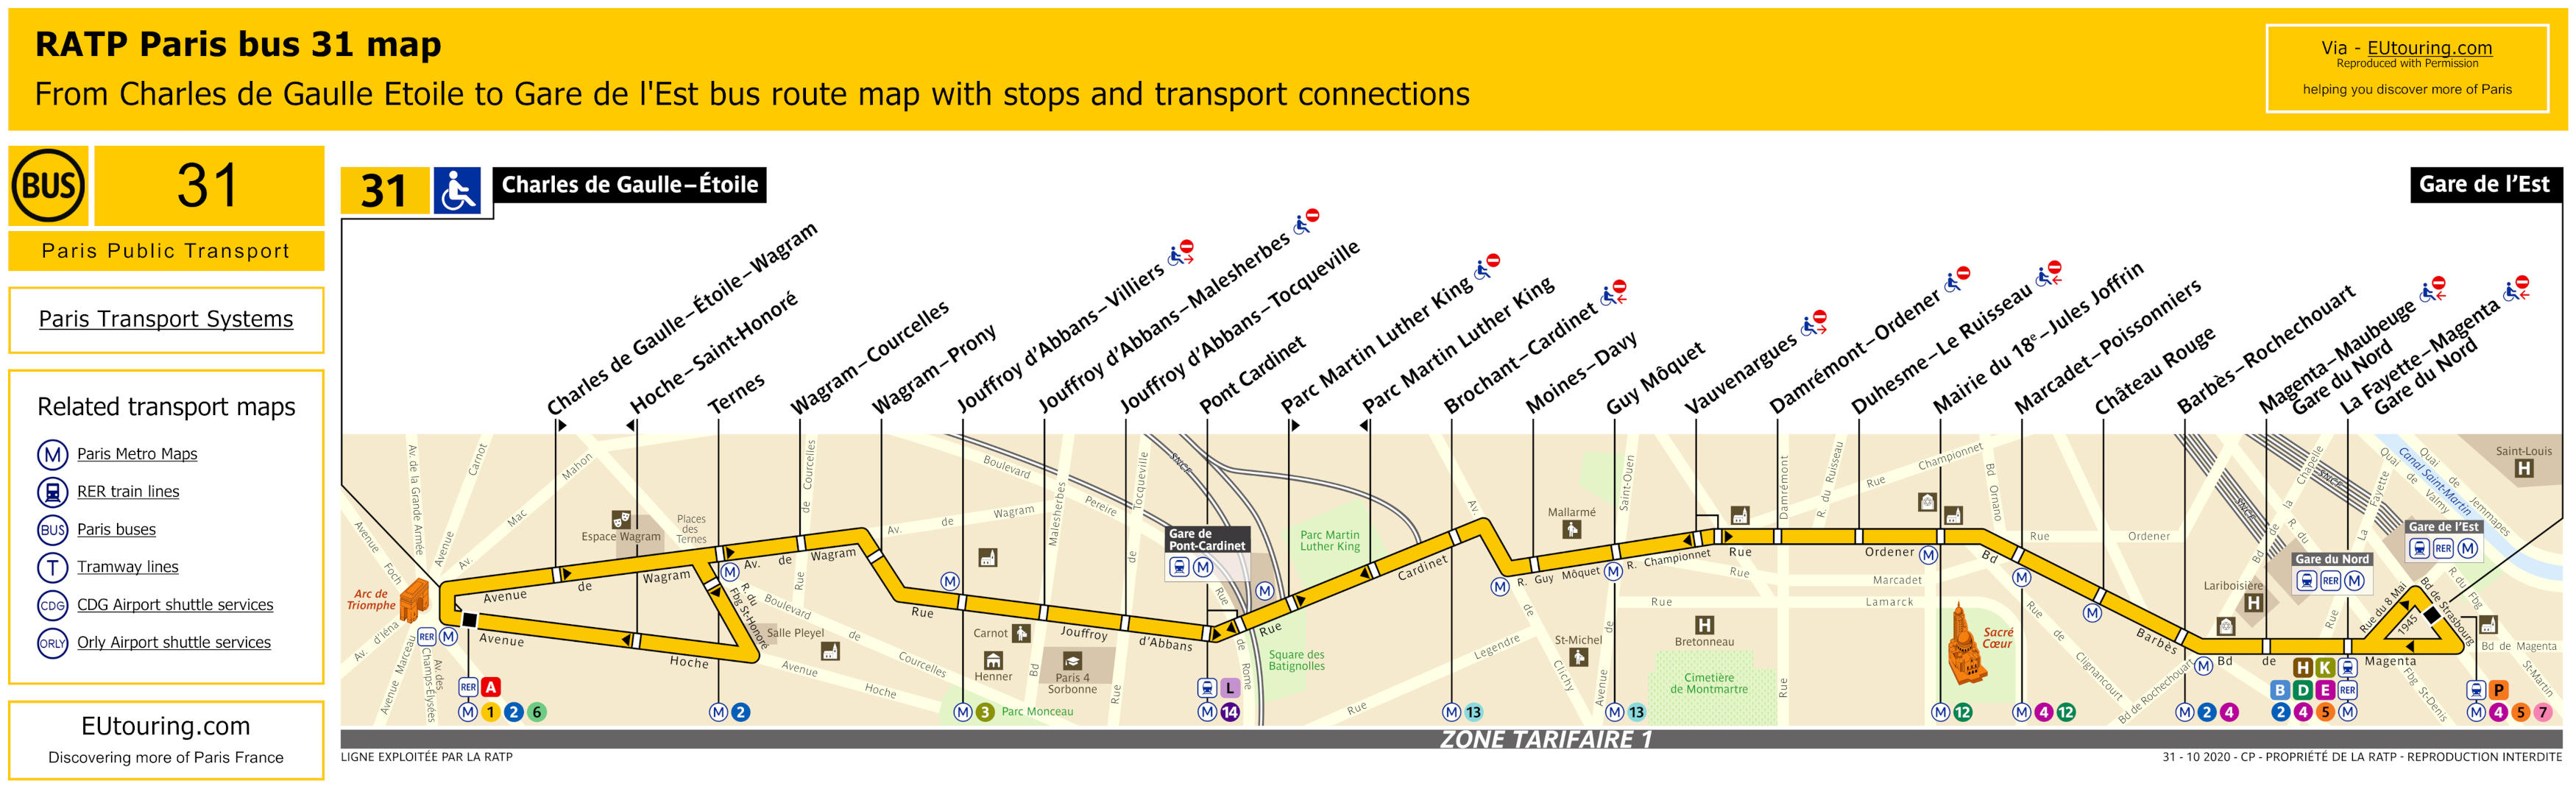 RATP route maps for Paris bus lines 30 through to 39